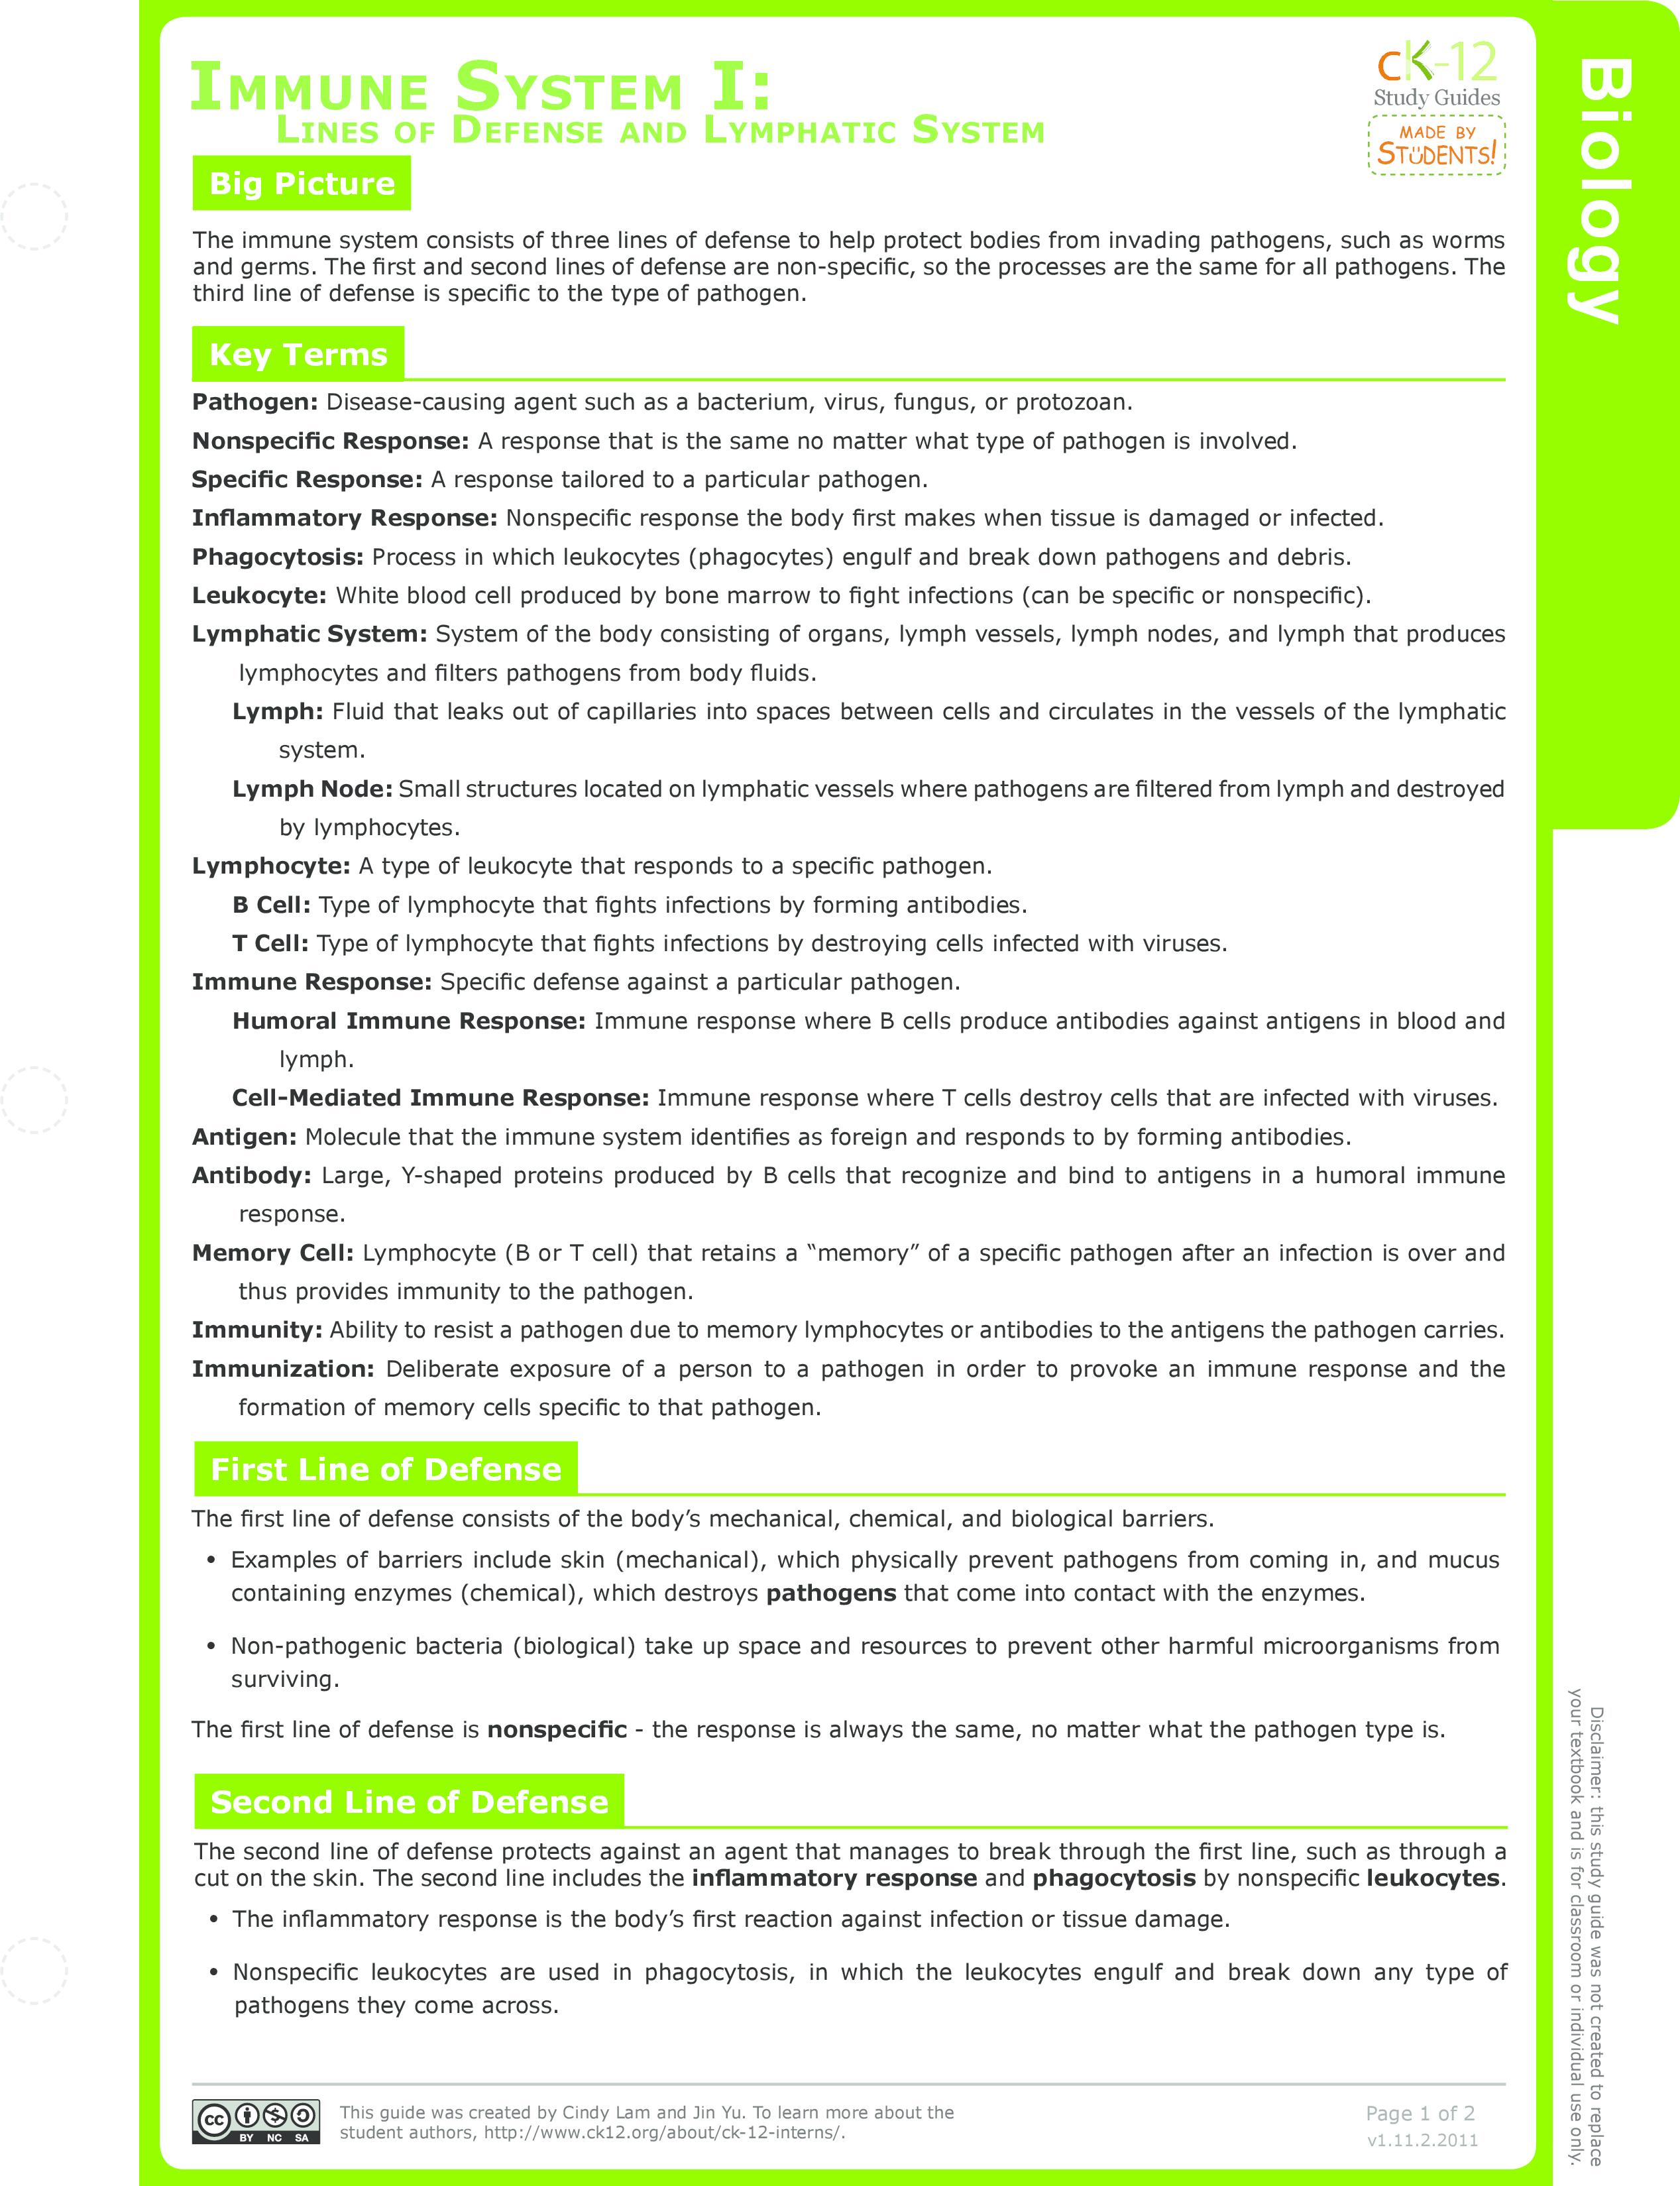 Innate Immune System Ck 12 Foundation